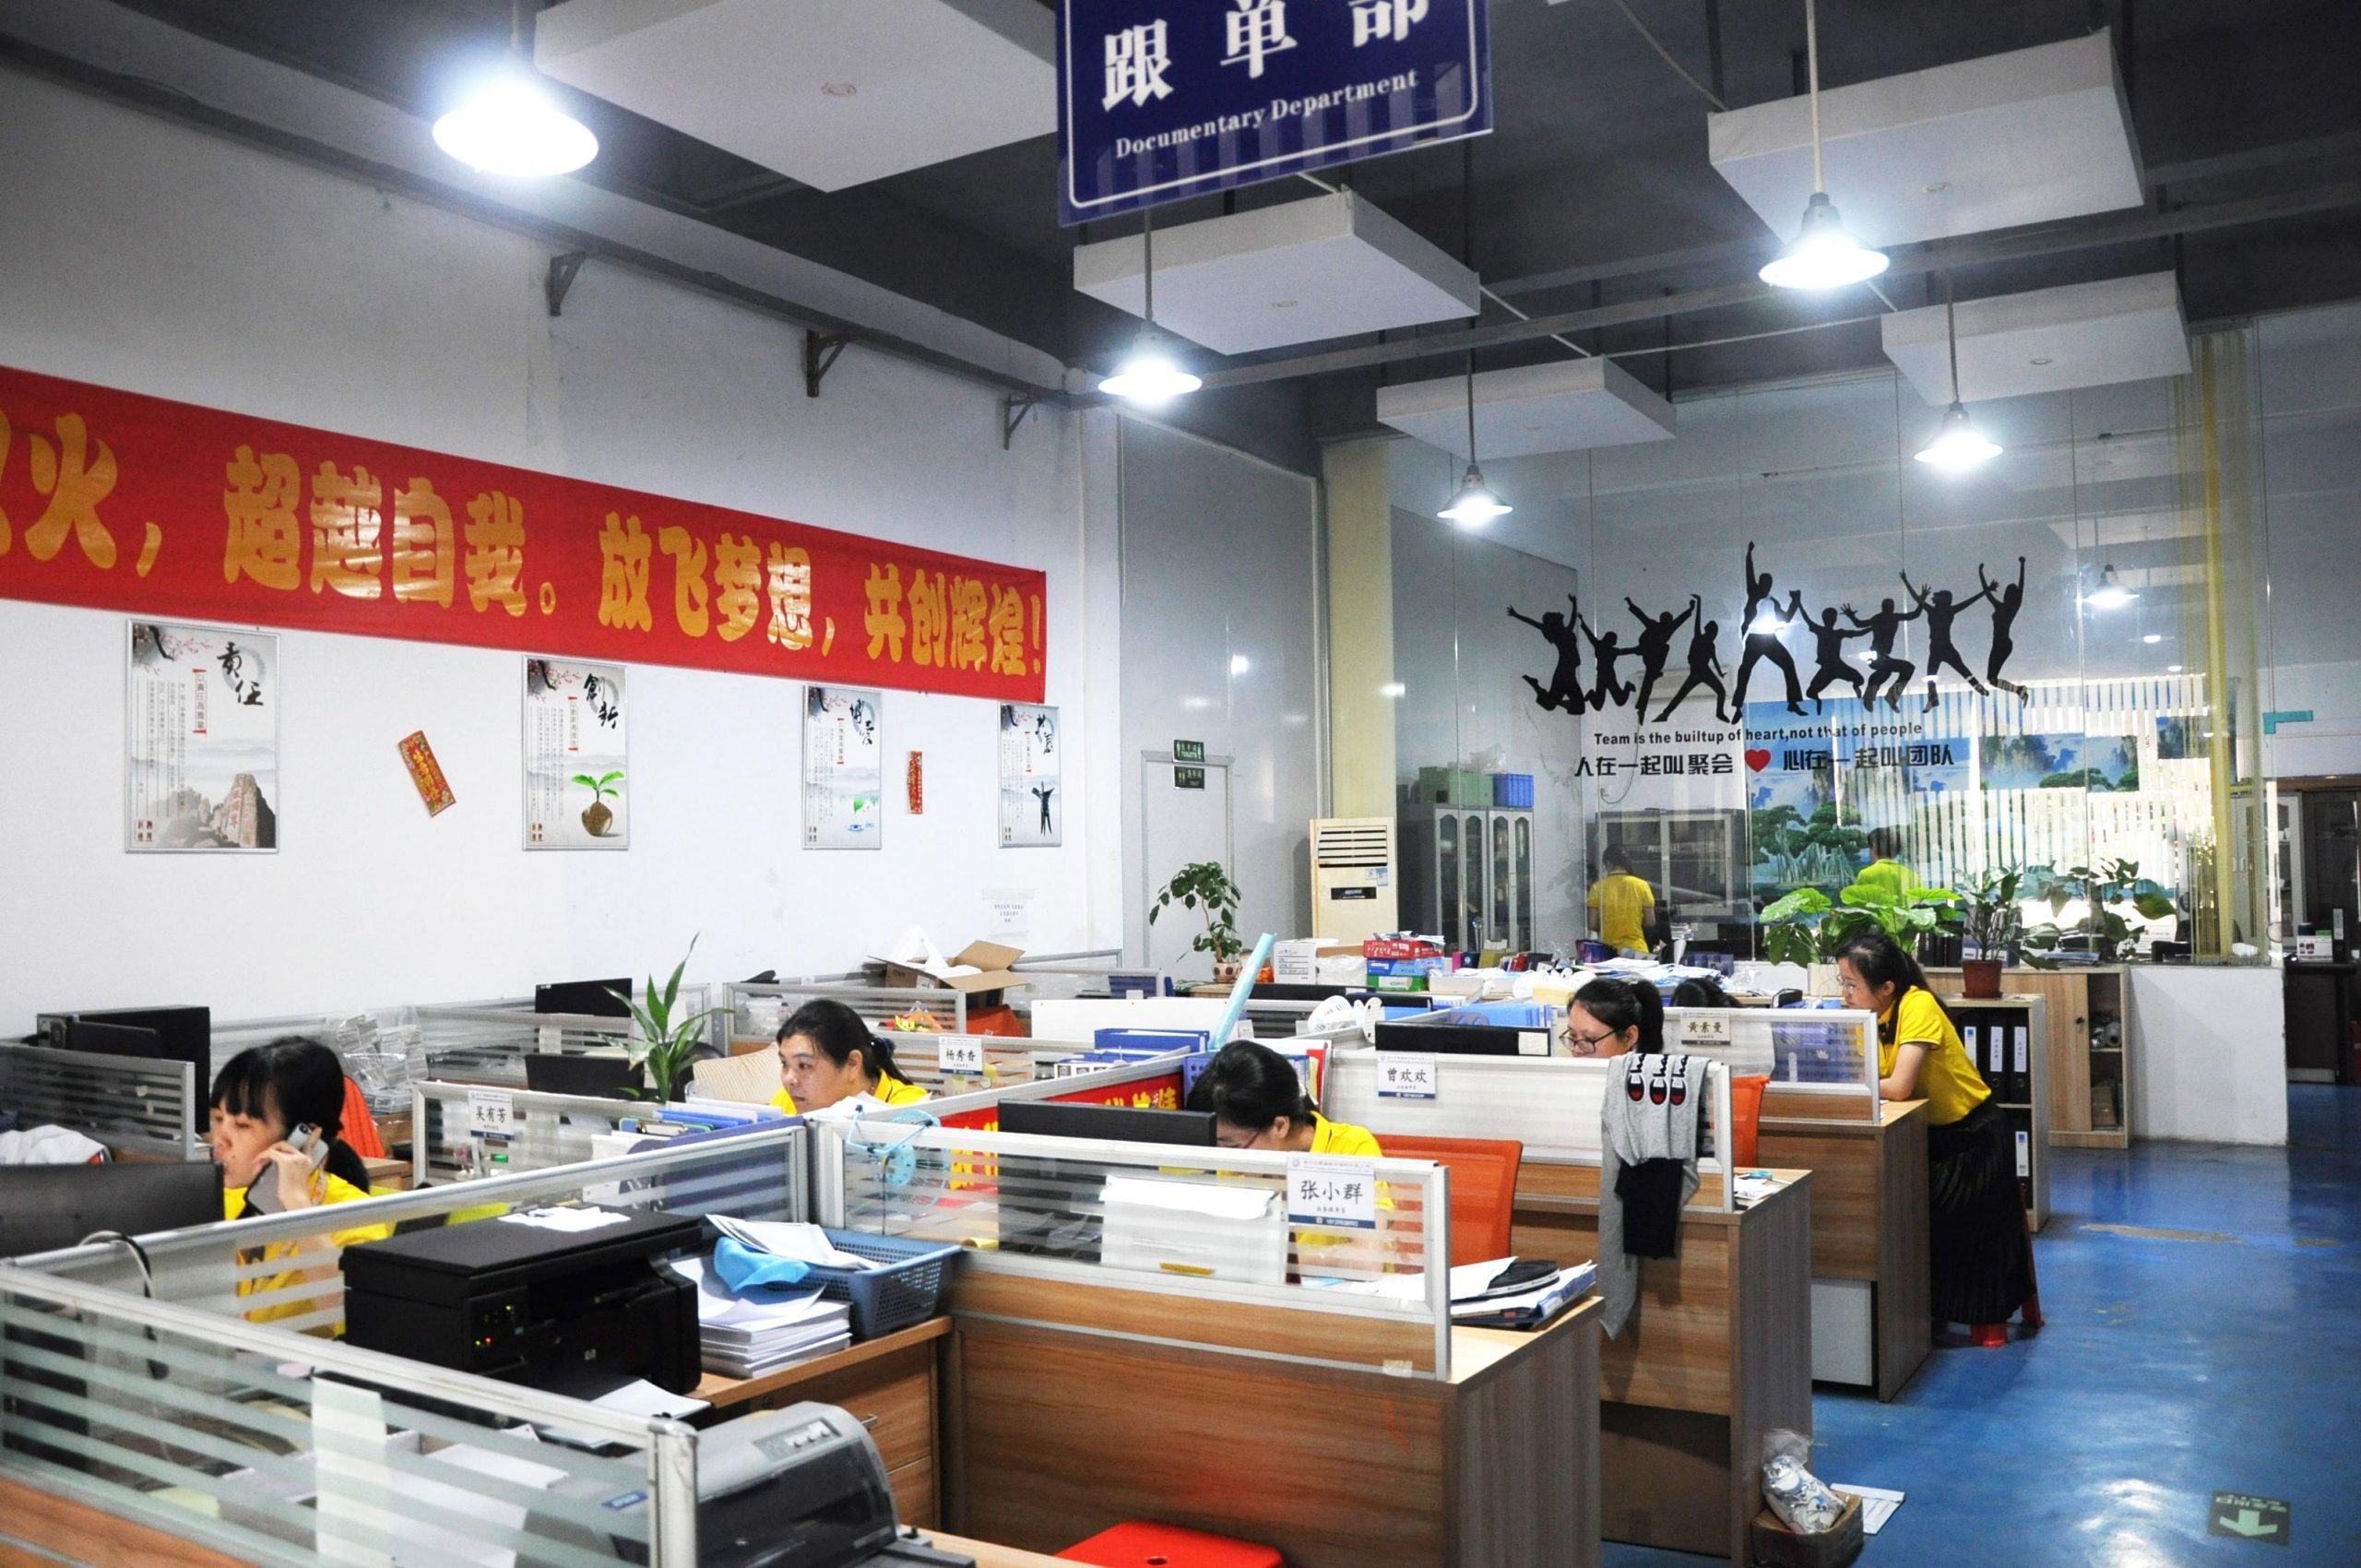 Documentary Department